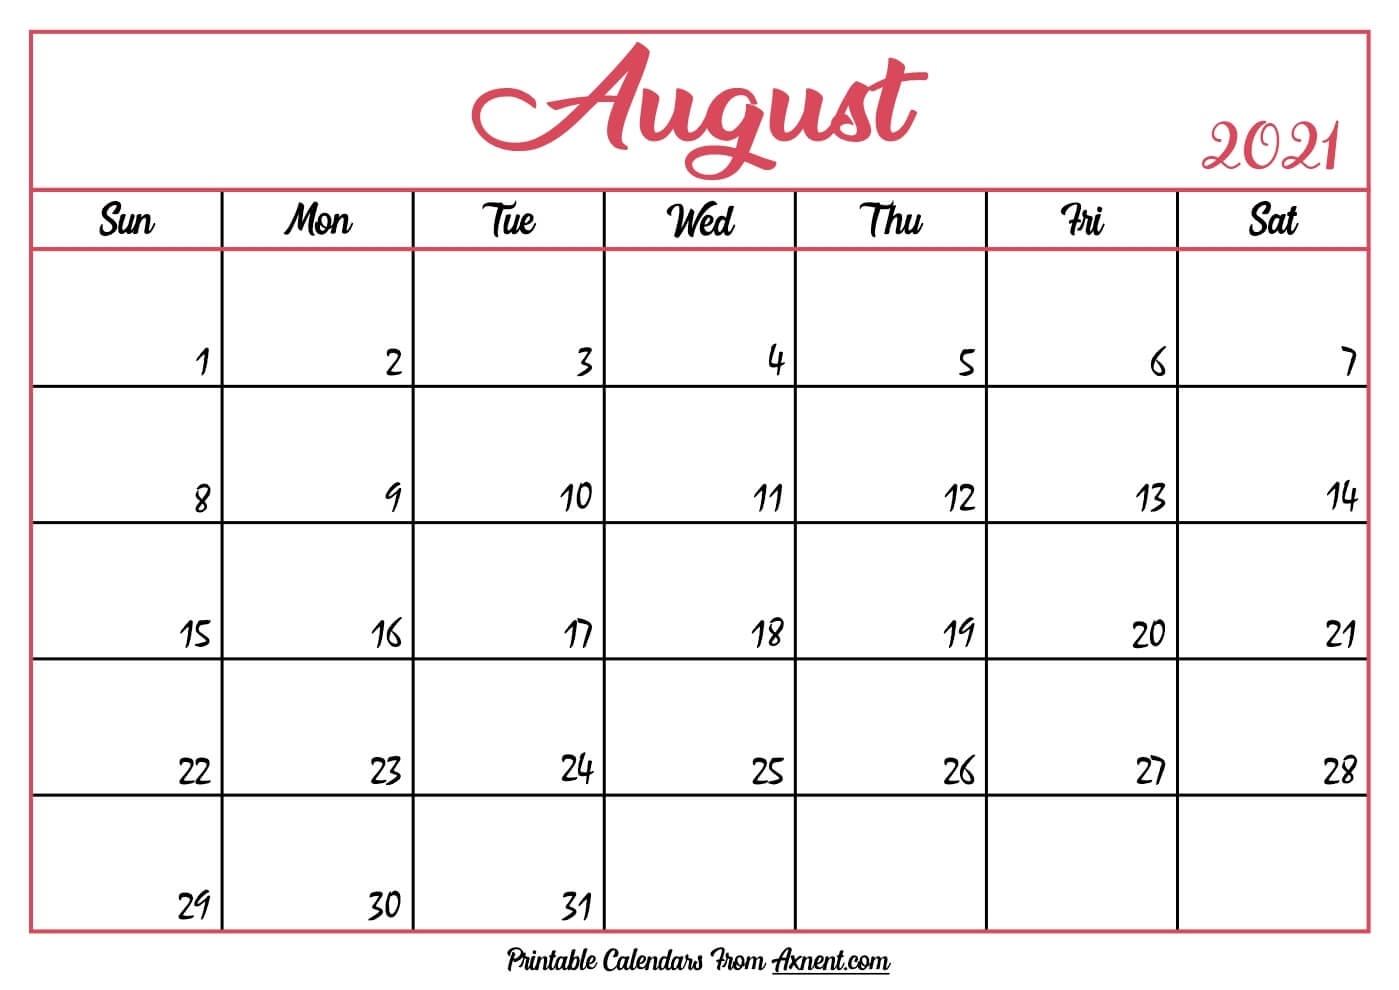 Printable August 2021 Calendar Template - Time Management Tools Printable August 2021 Calendar Calendar Ortodox August 2021 Patriarhie